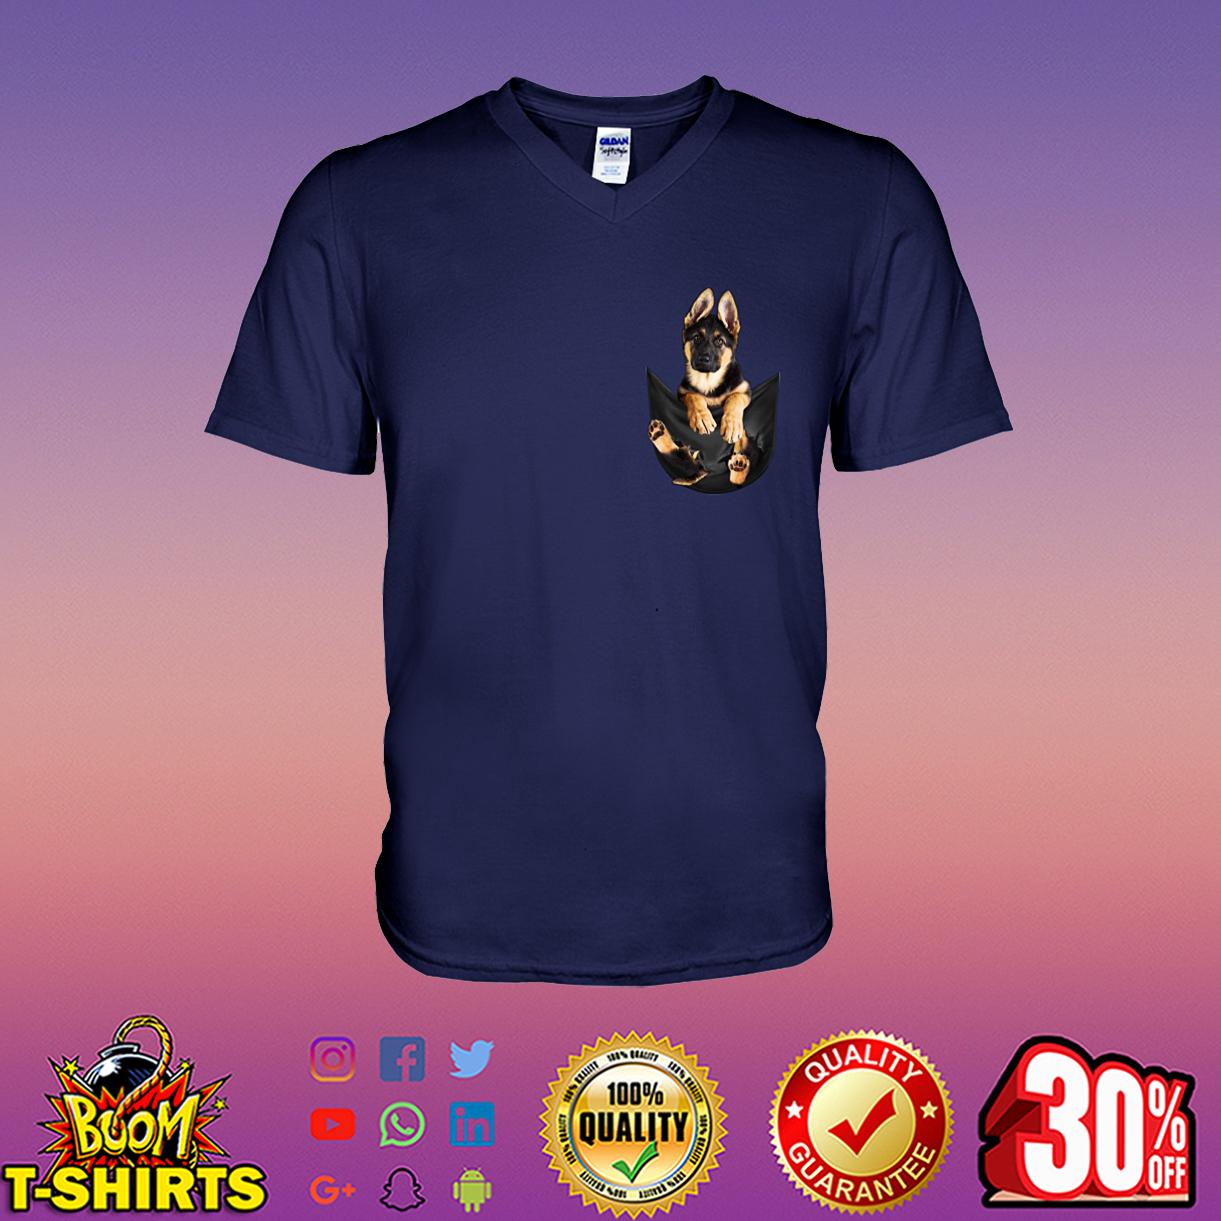 German Shepherd Pocket v-neck t-shirt